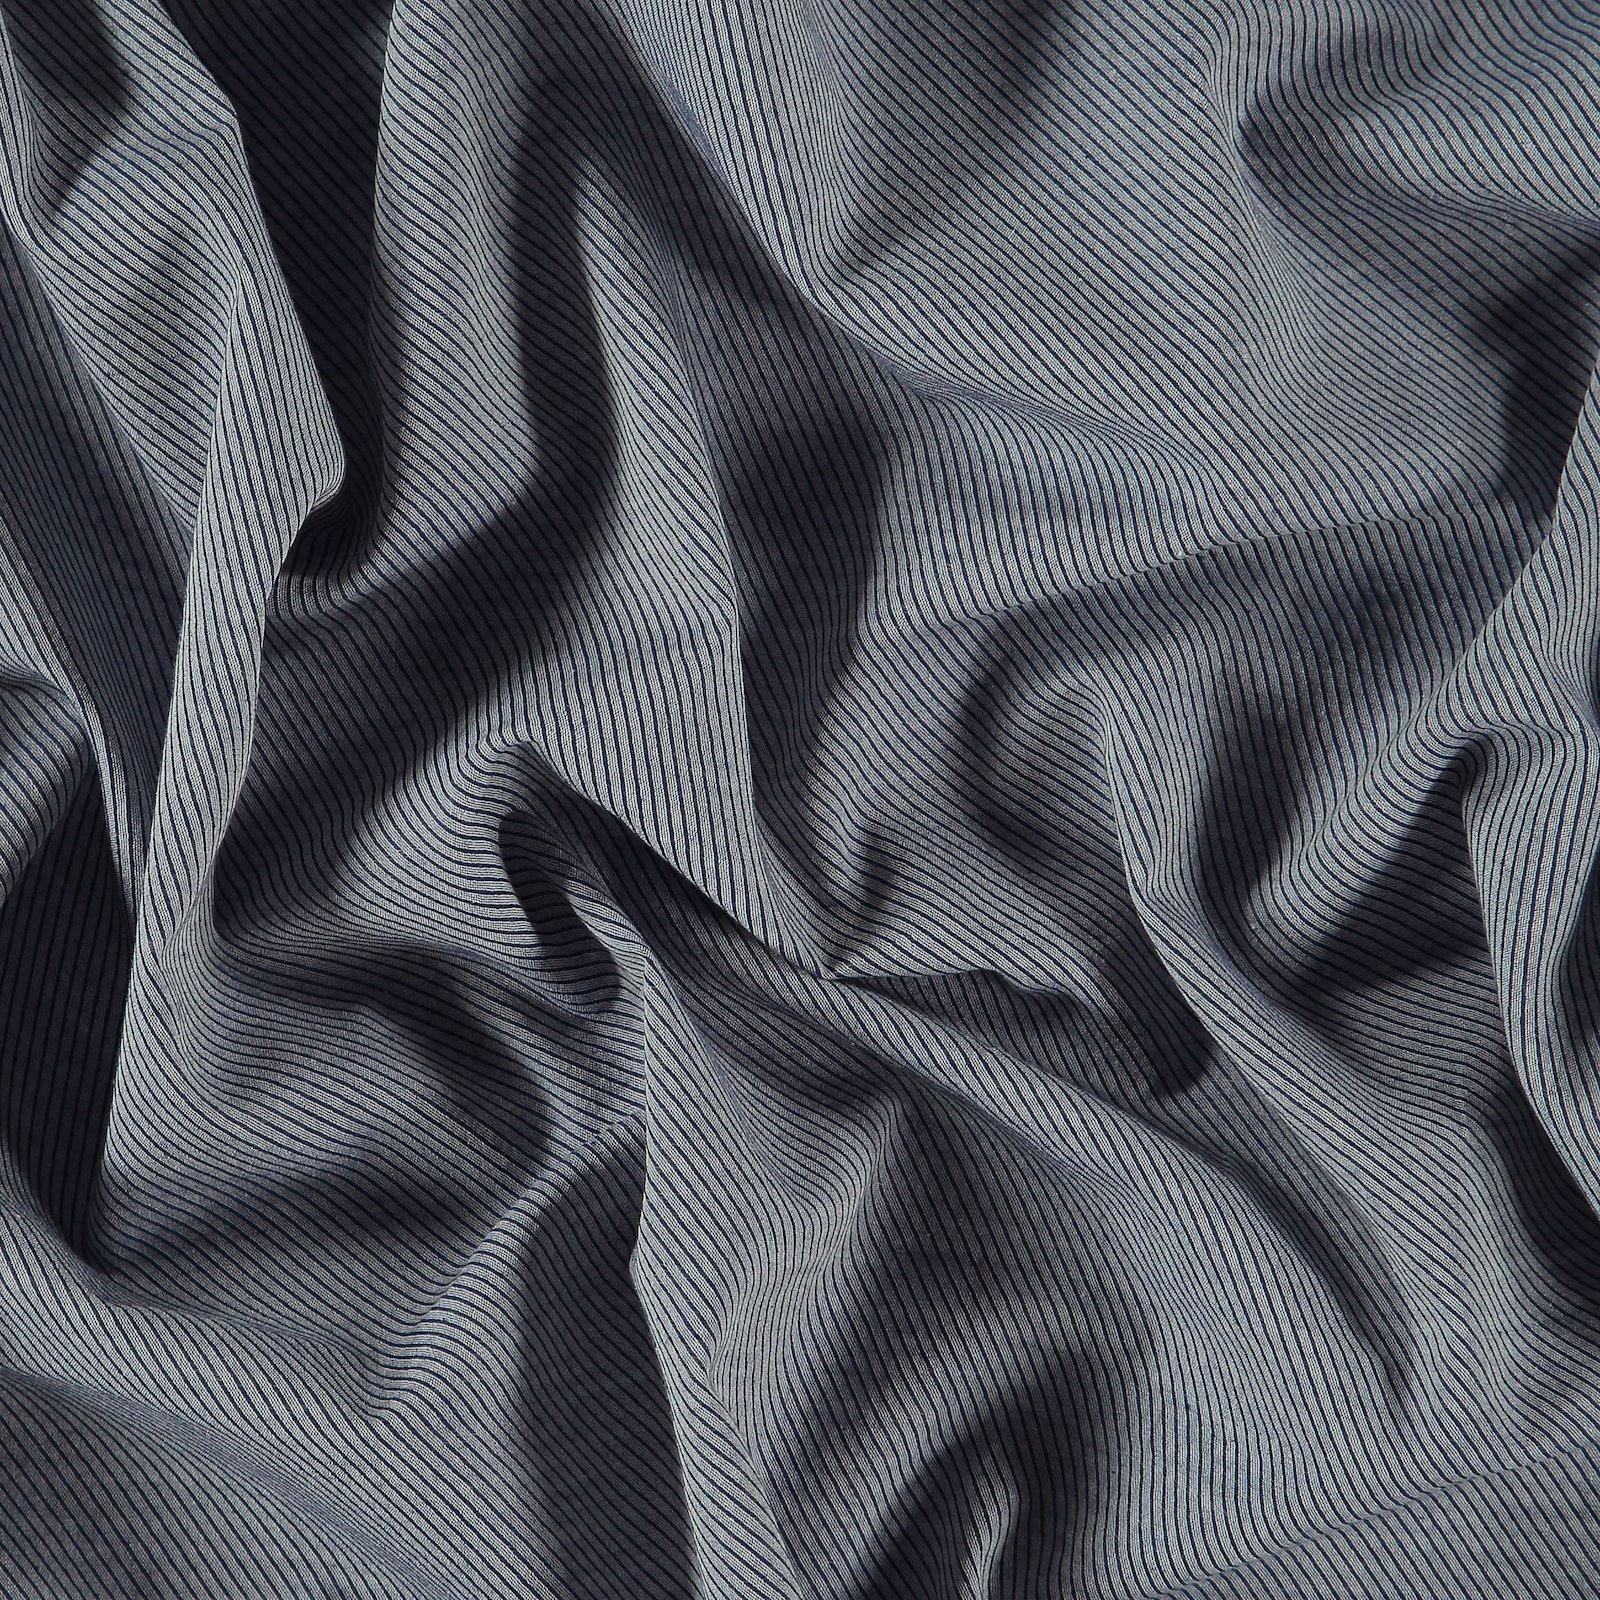 Woven cotton dusty blue/white YD stripe